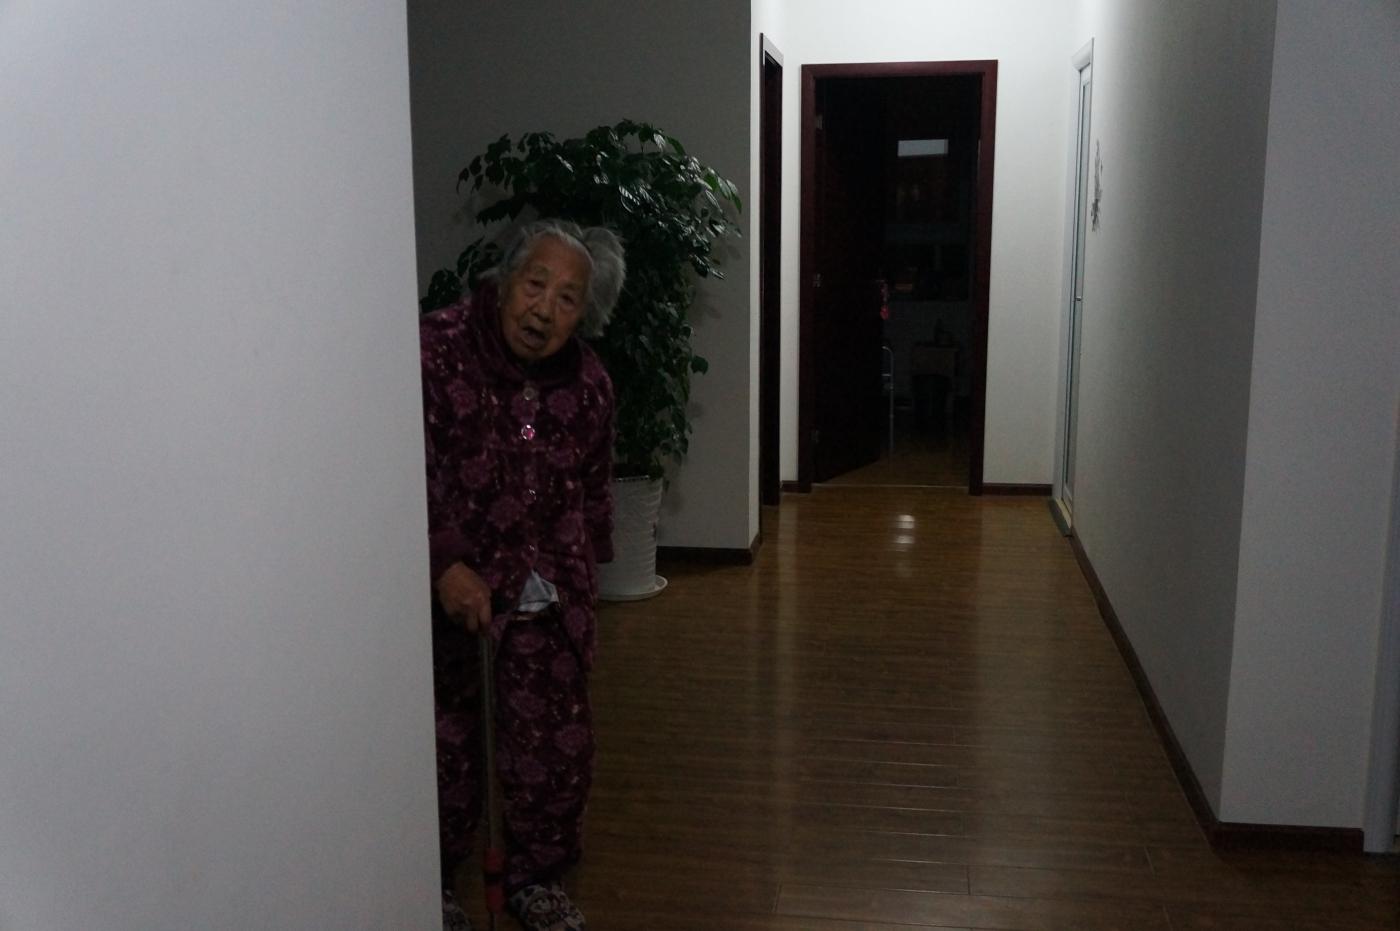 [jiejoy]回家_图1-14